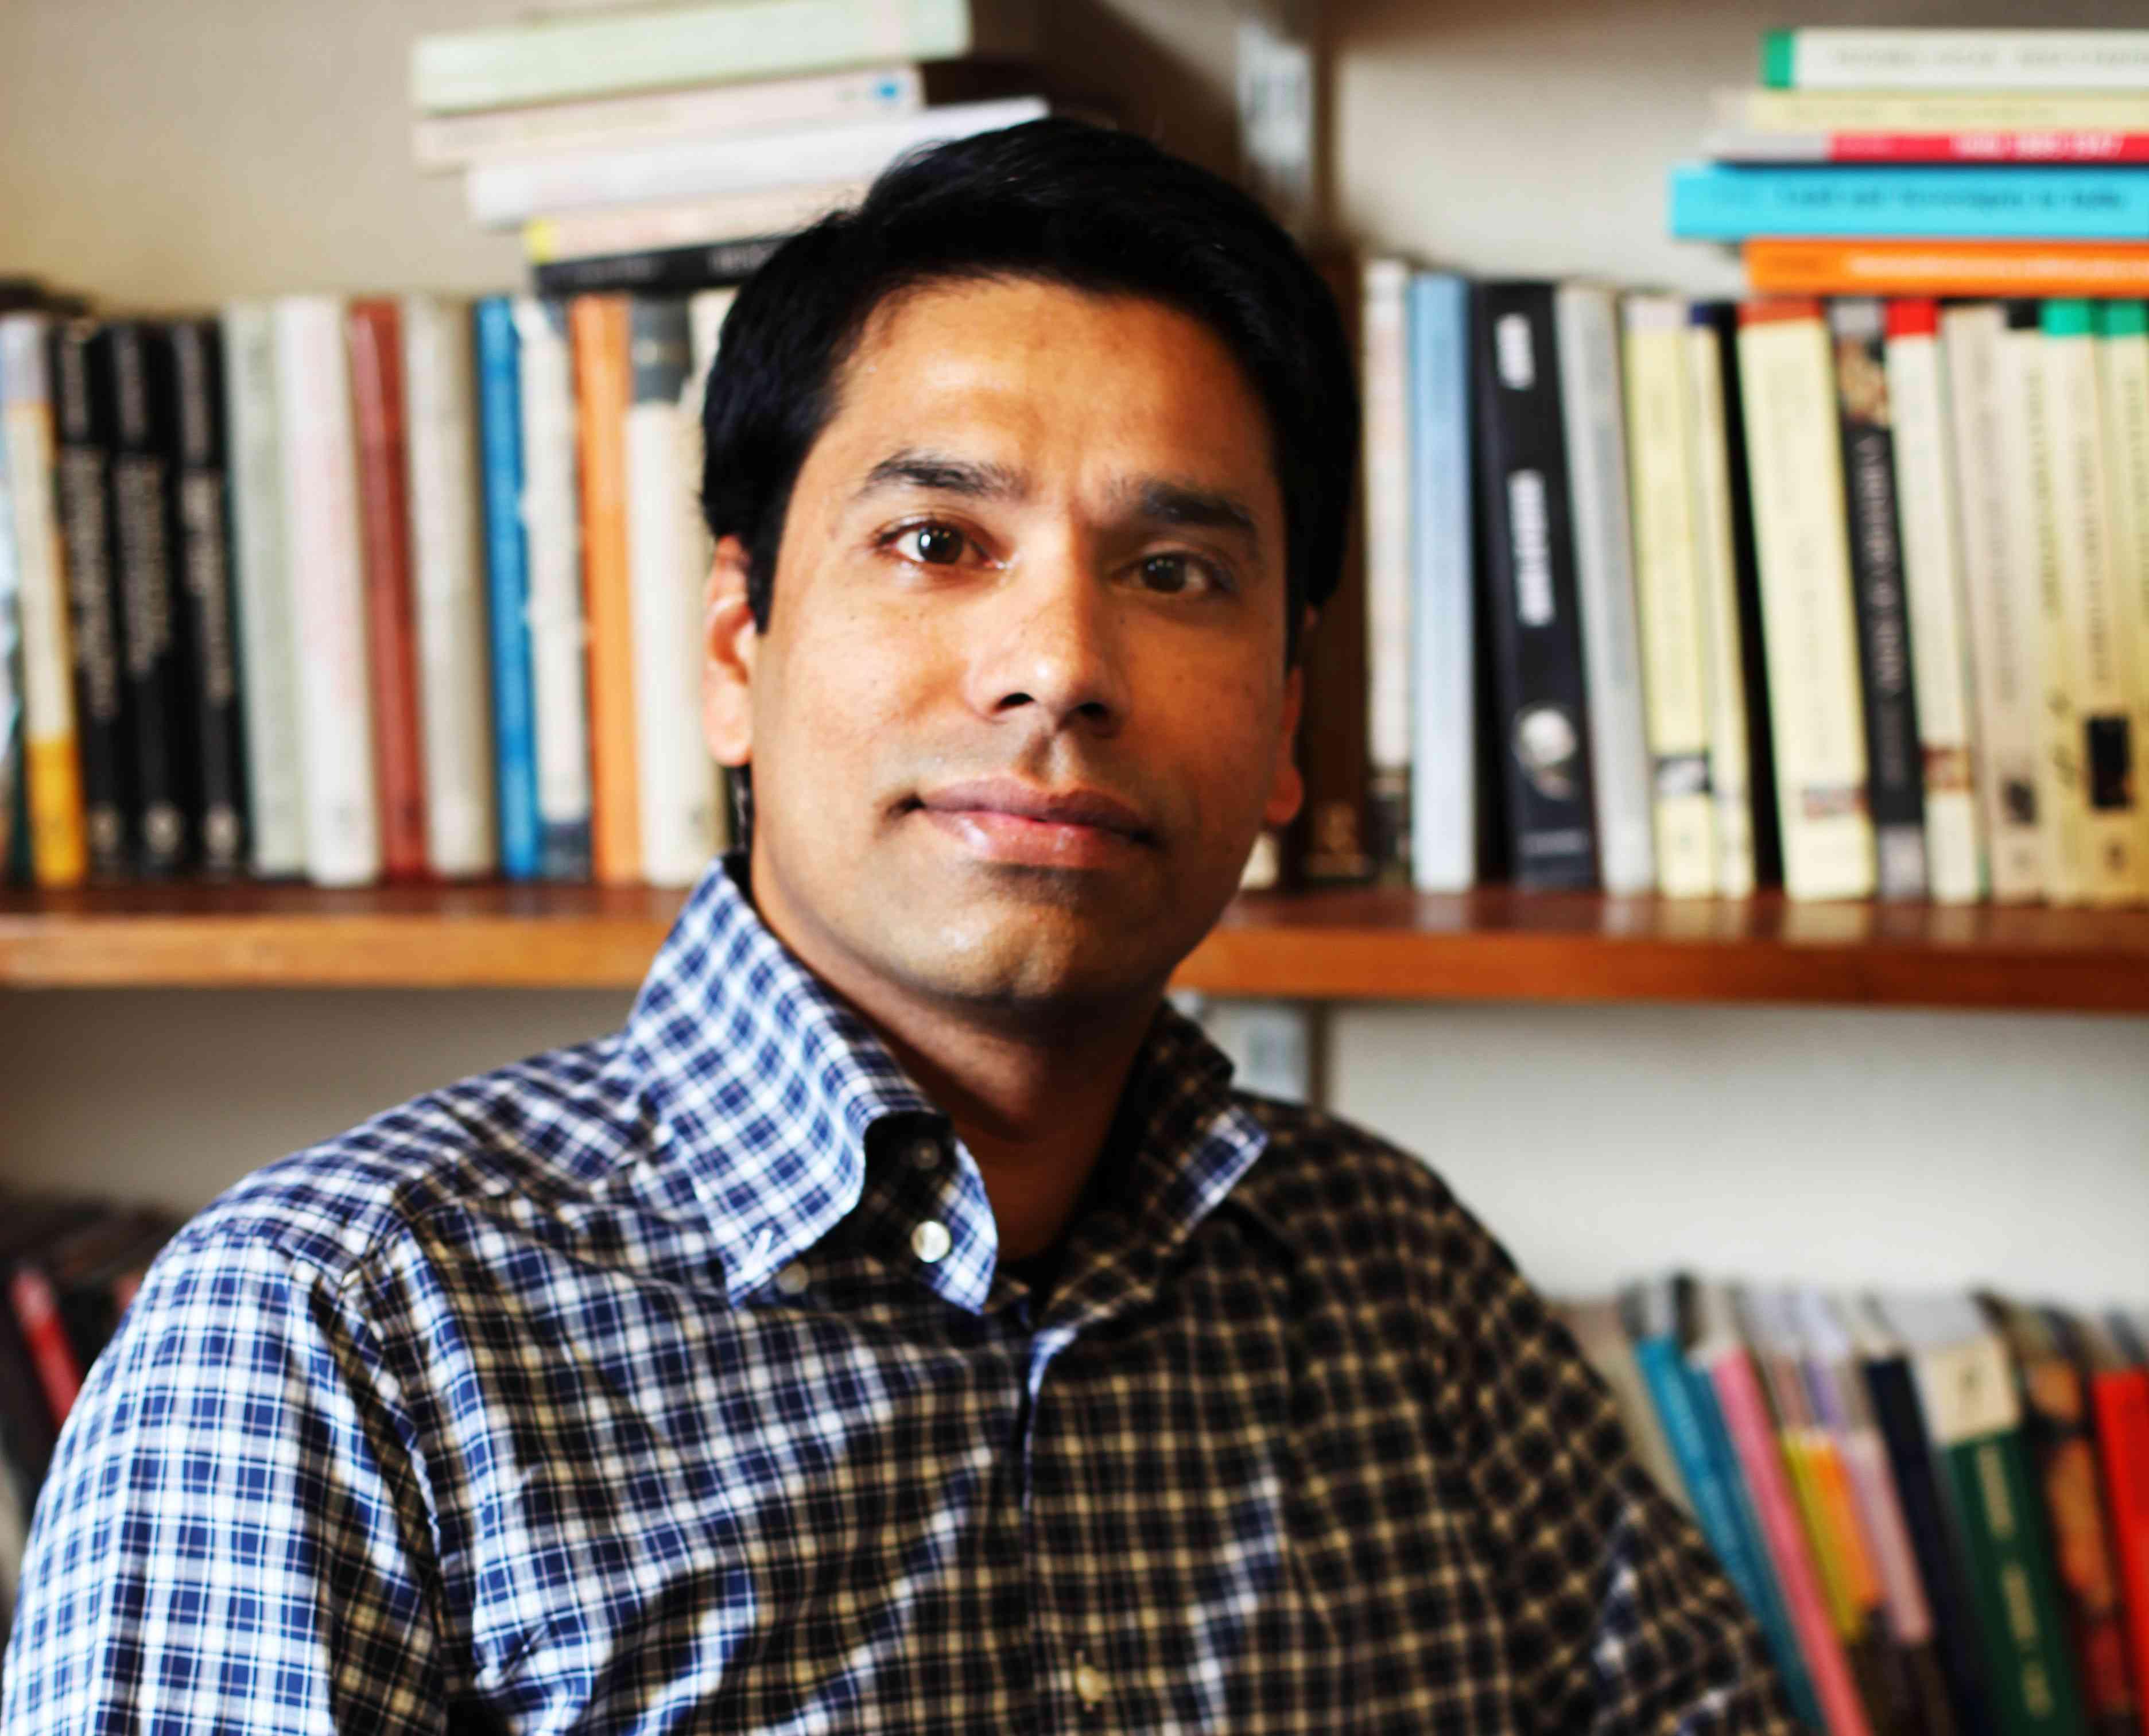 Historian Prashant Kidambi teaches at the University of Leicester.